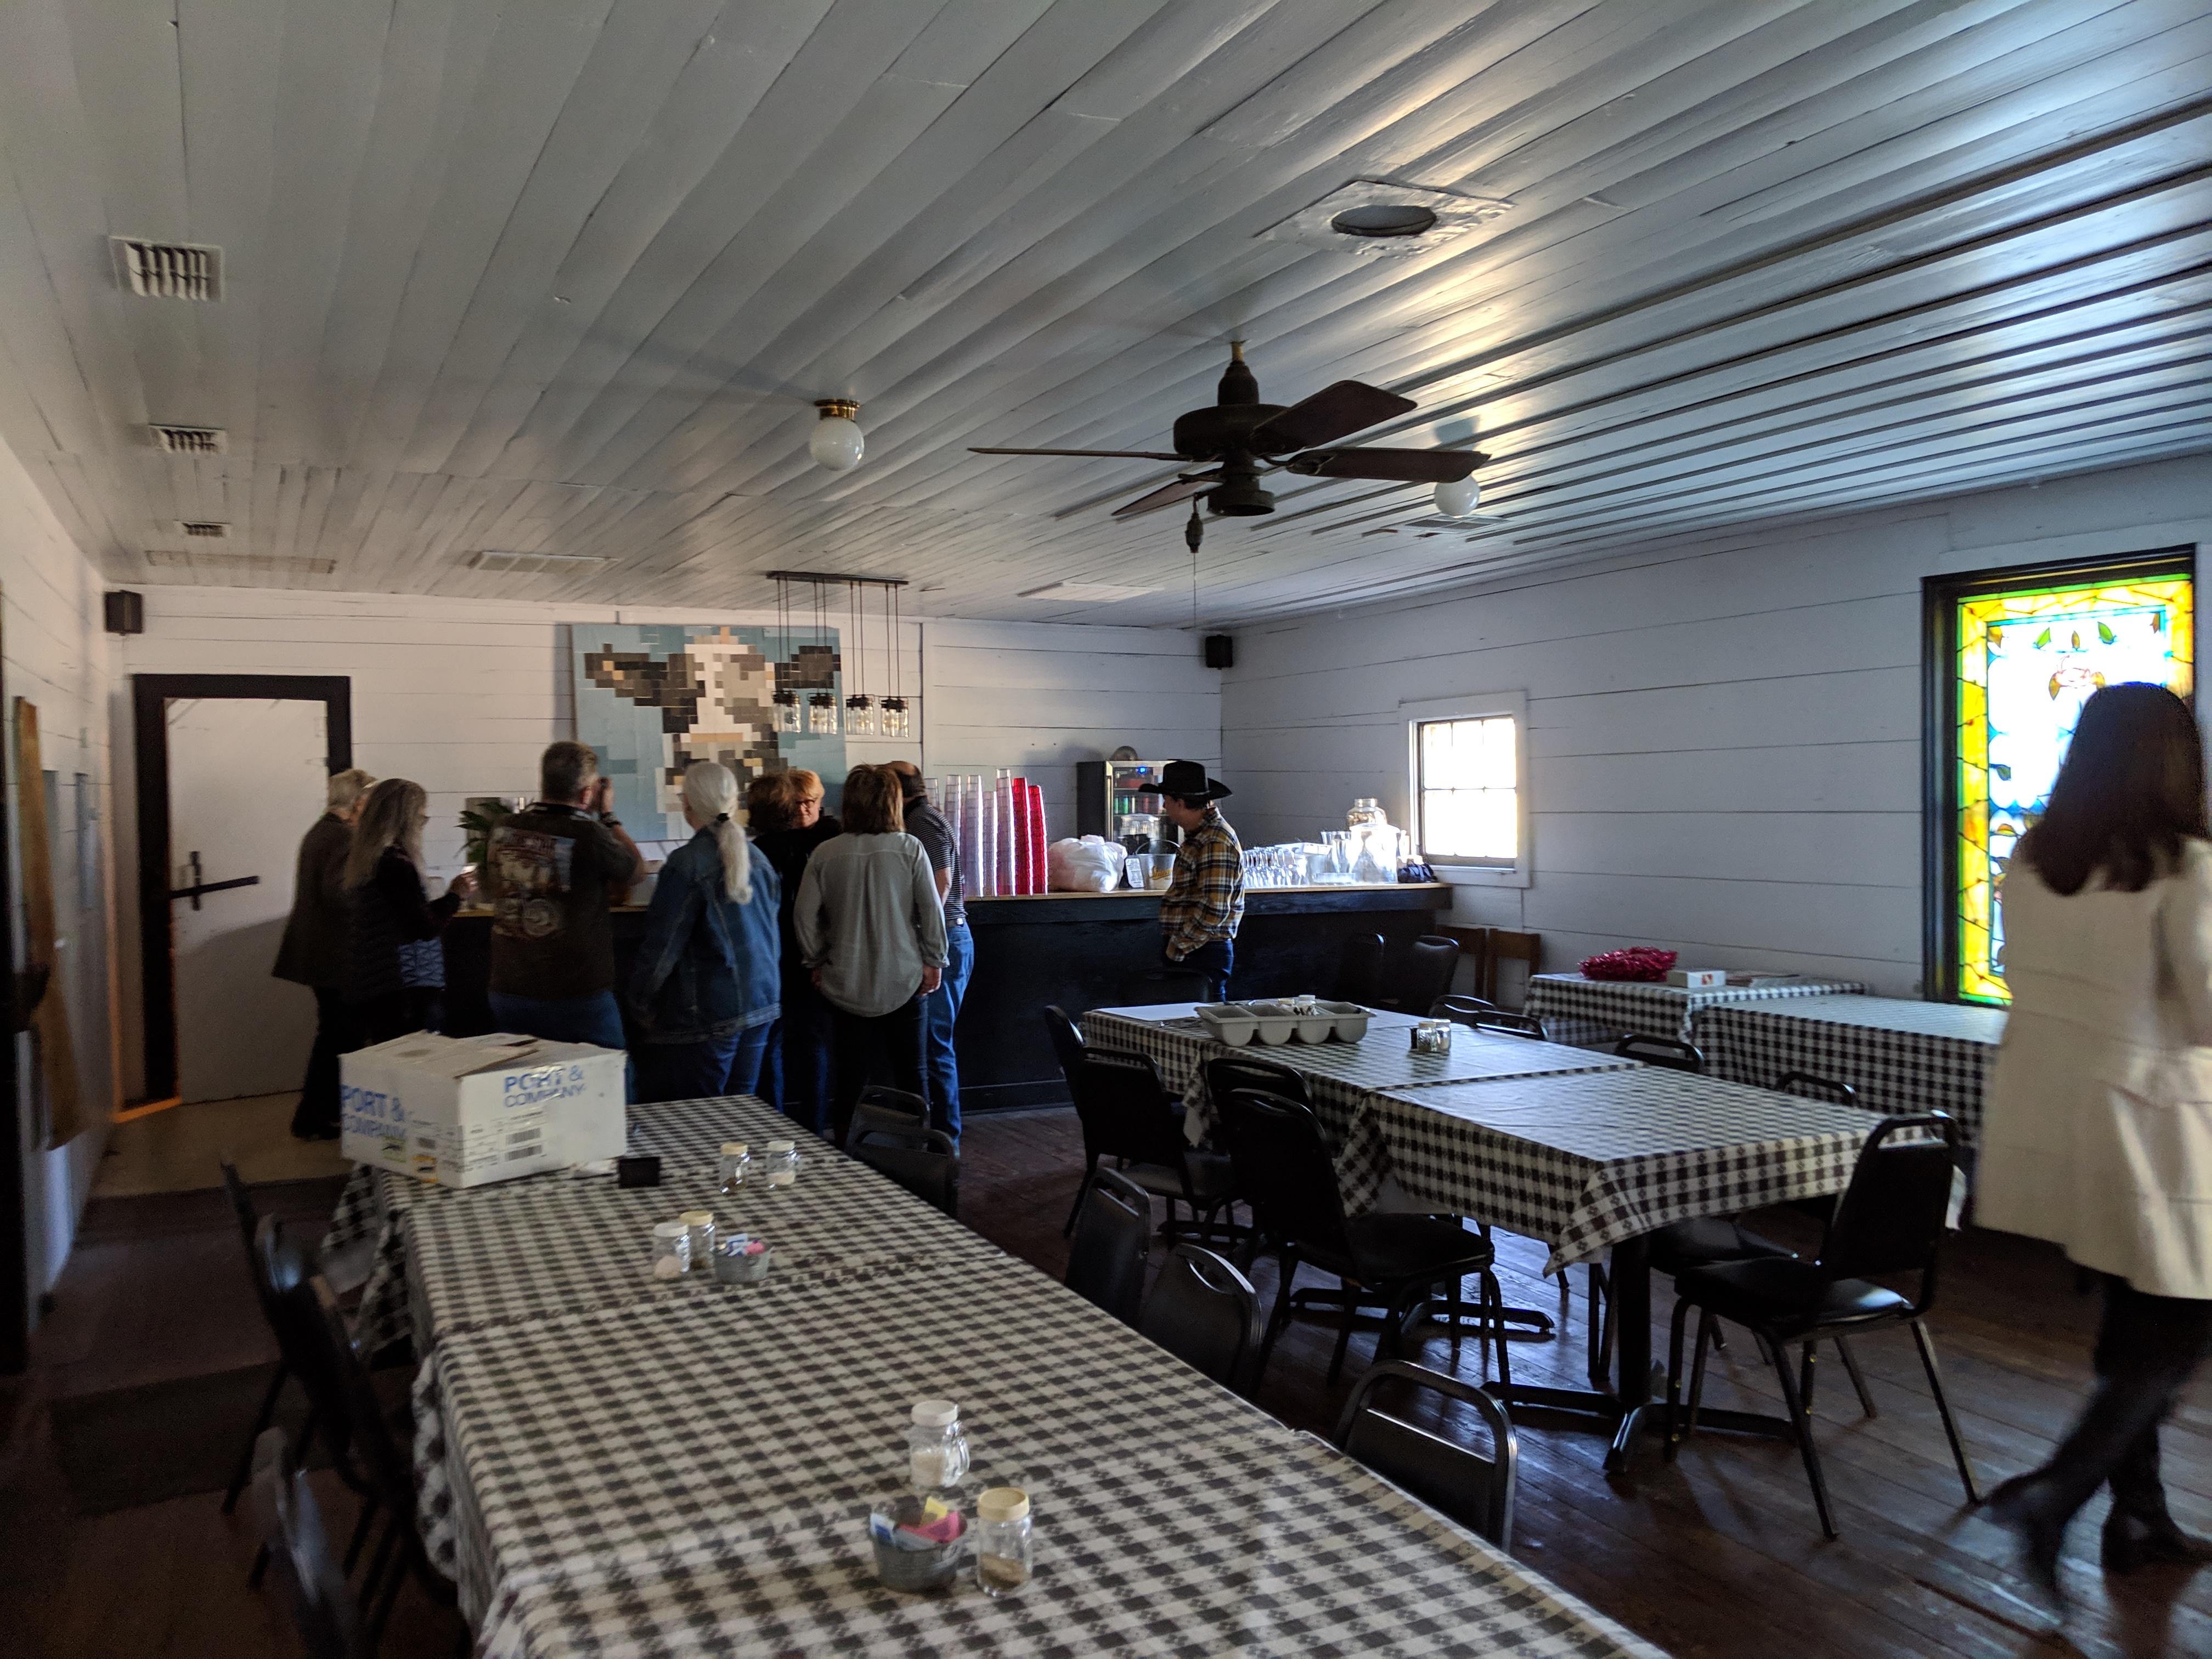 Dining area in bar area